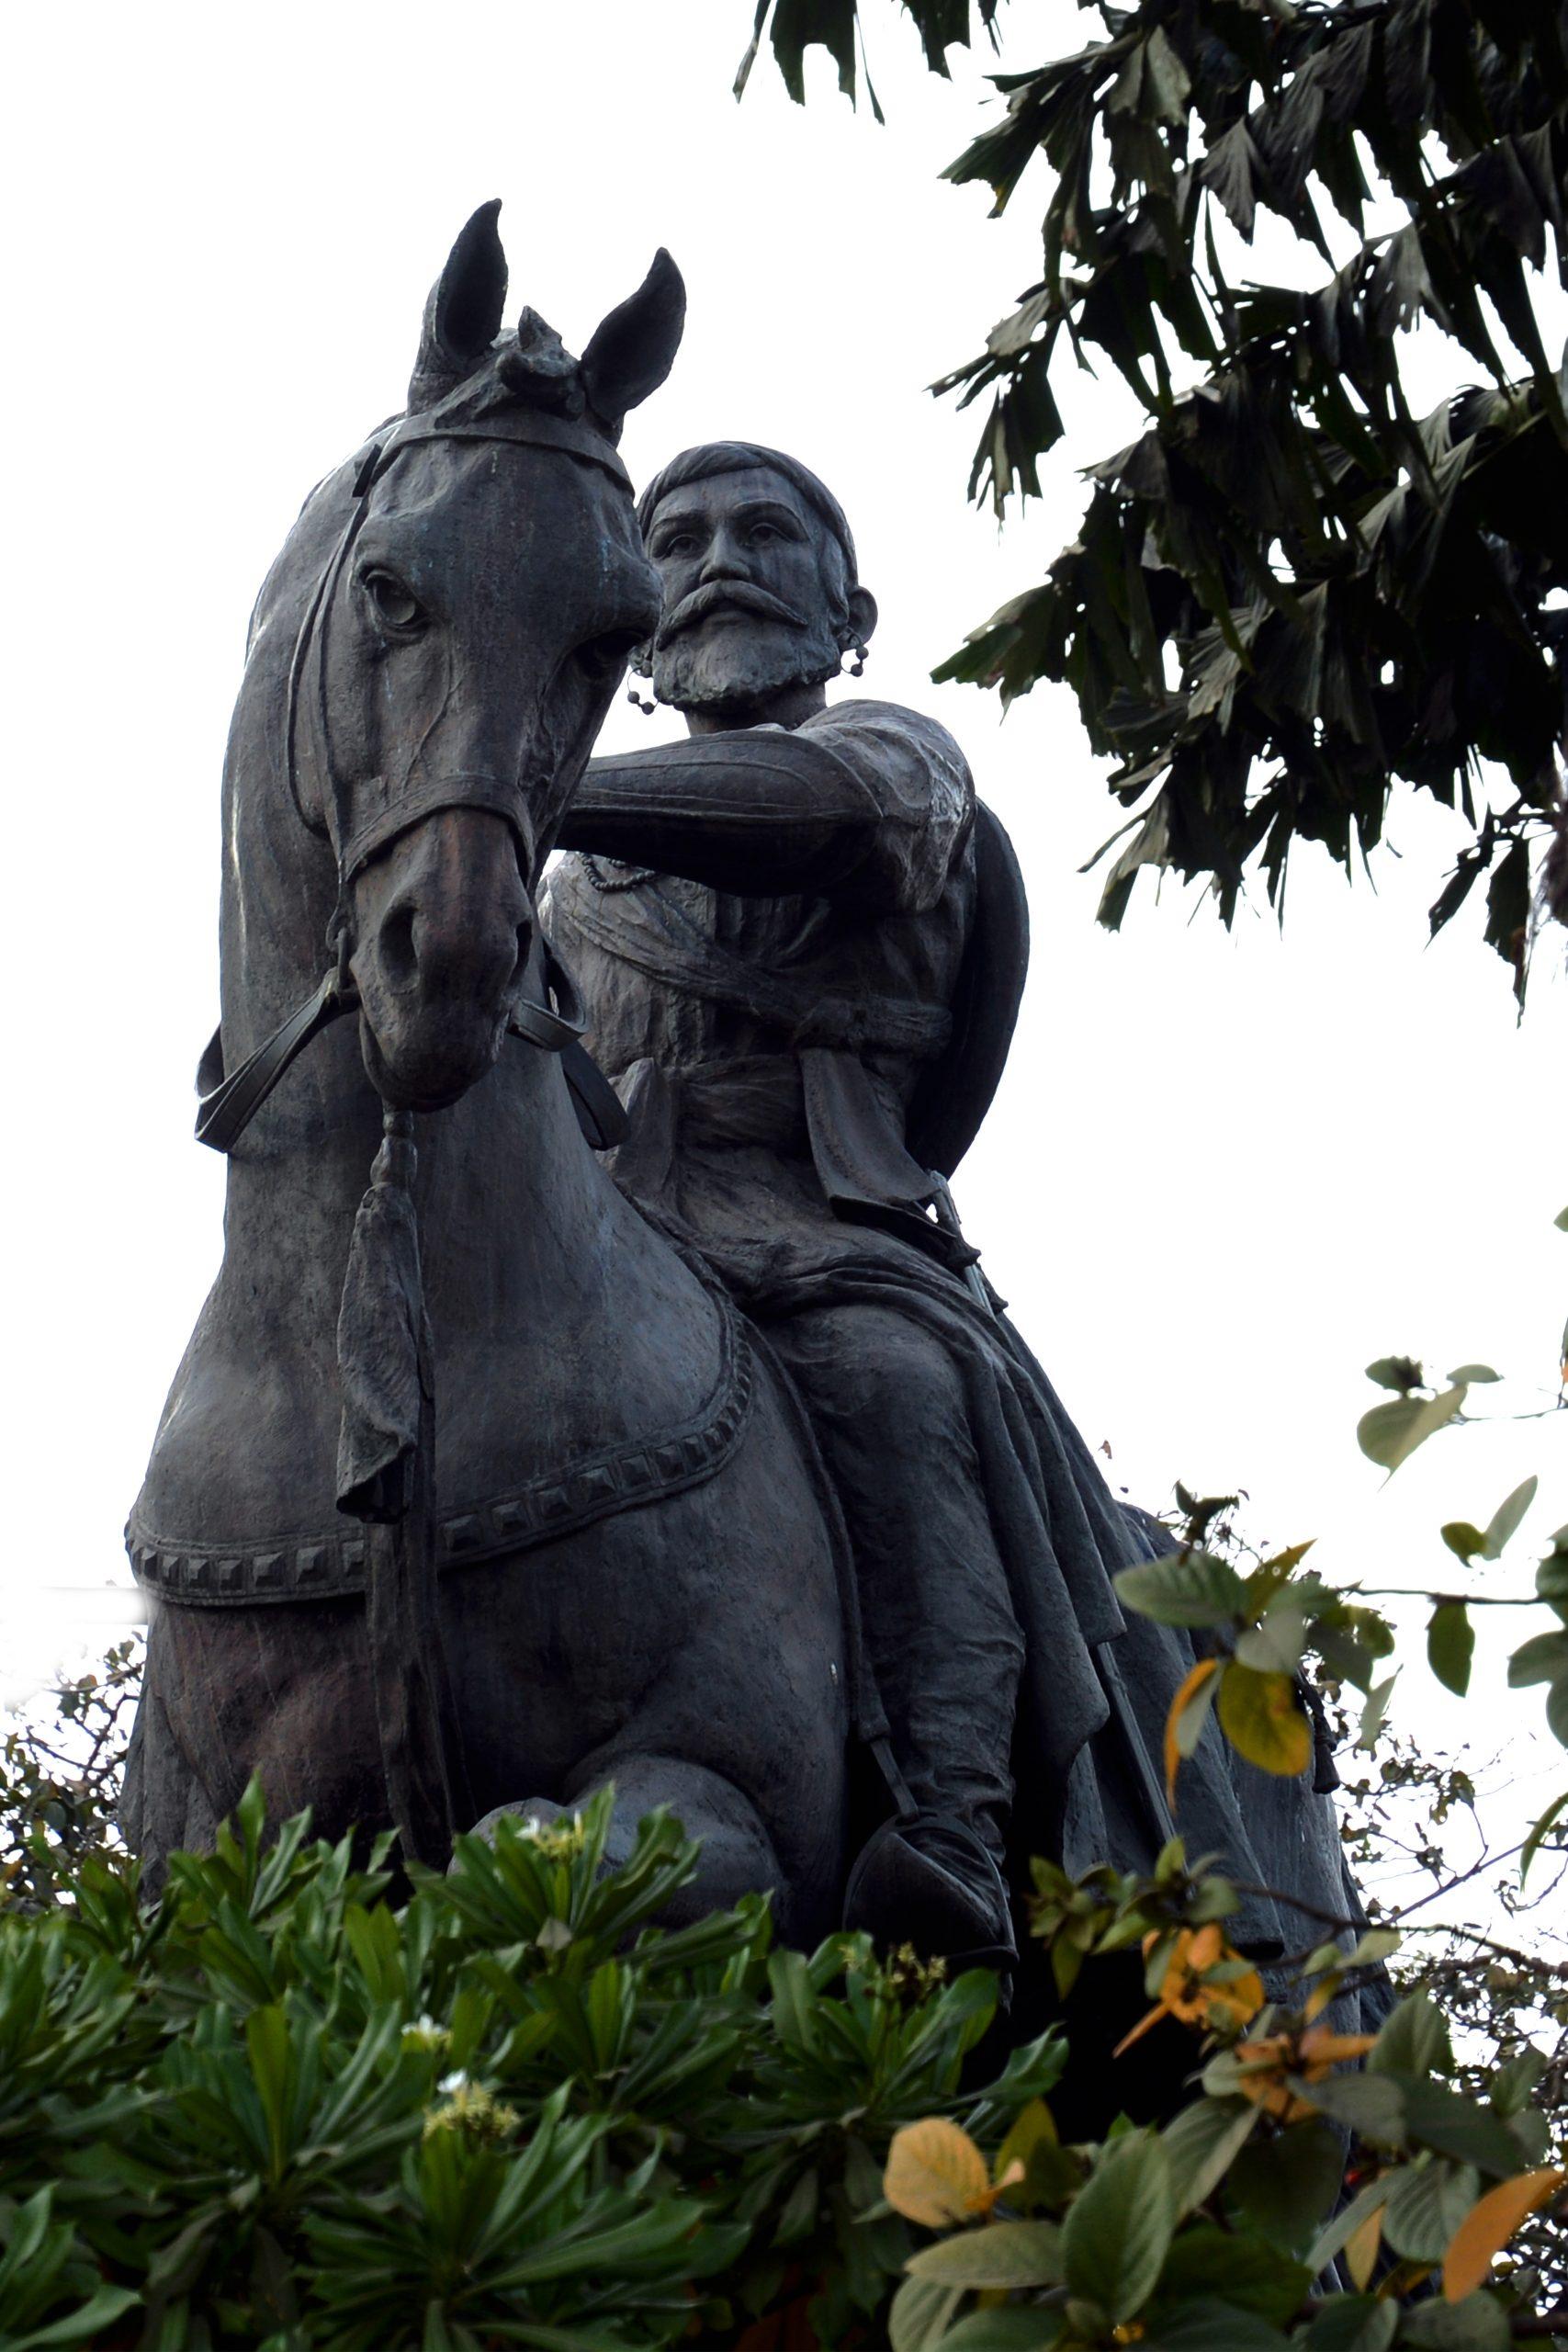 Statue of king Shivaji in a park